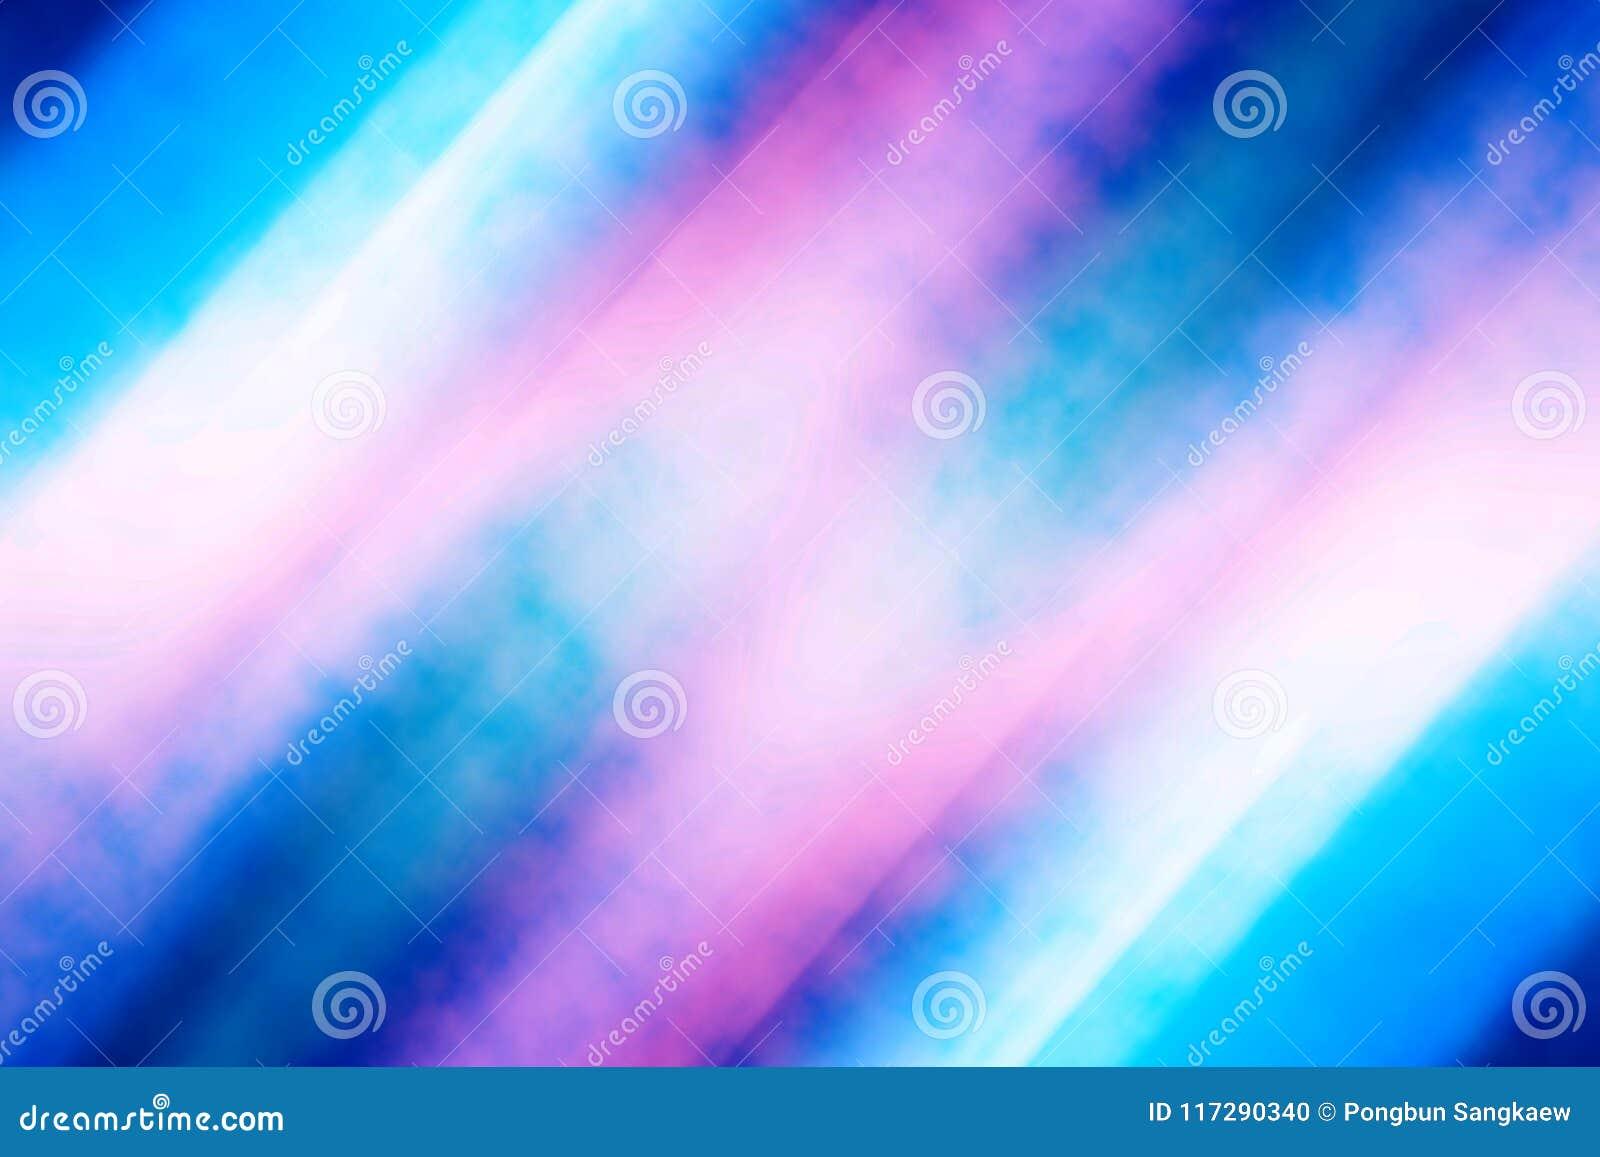 Light Blue And Purple Wallpaper Orice